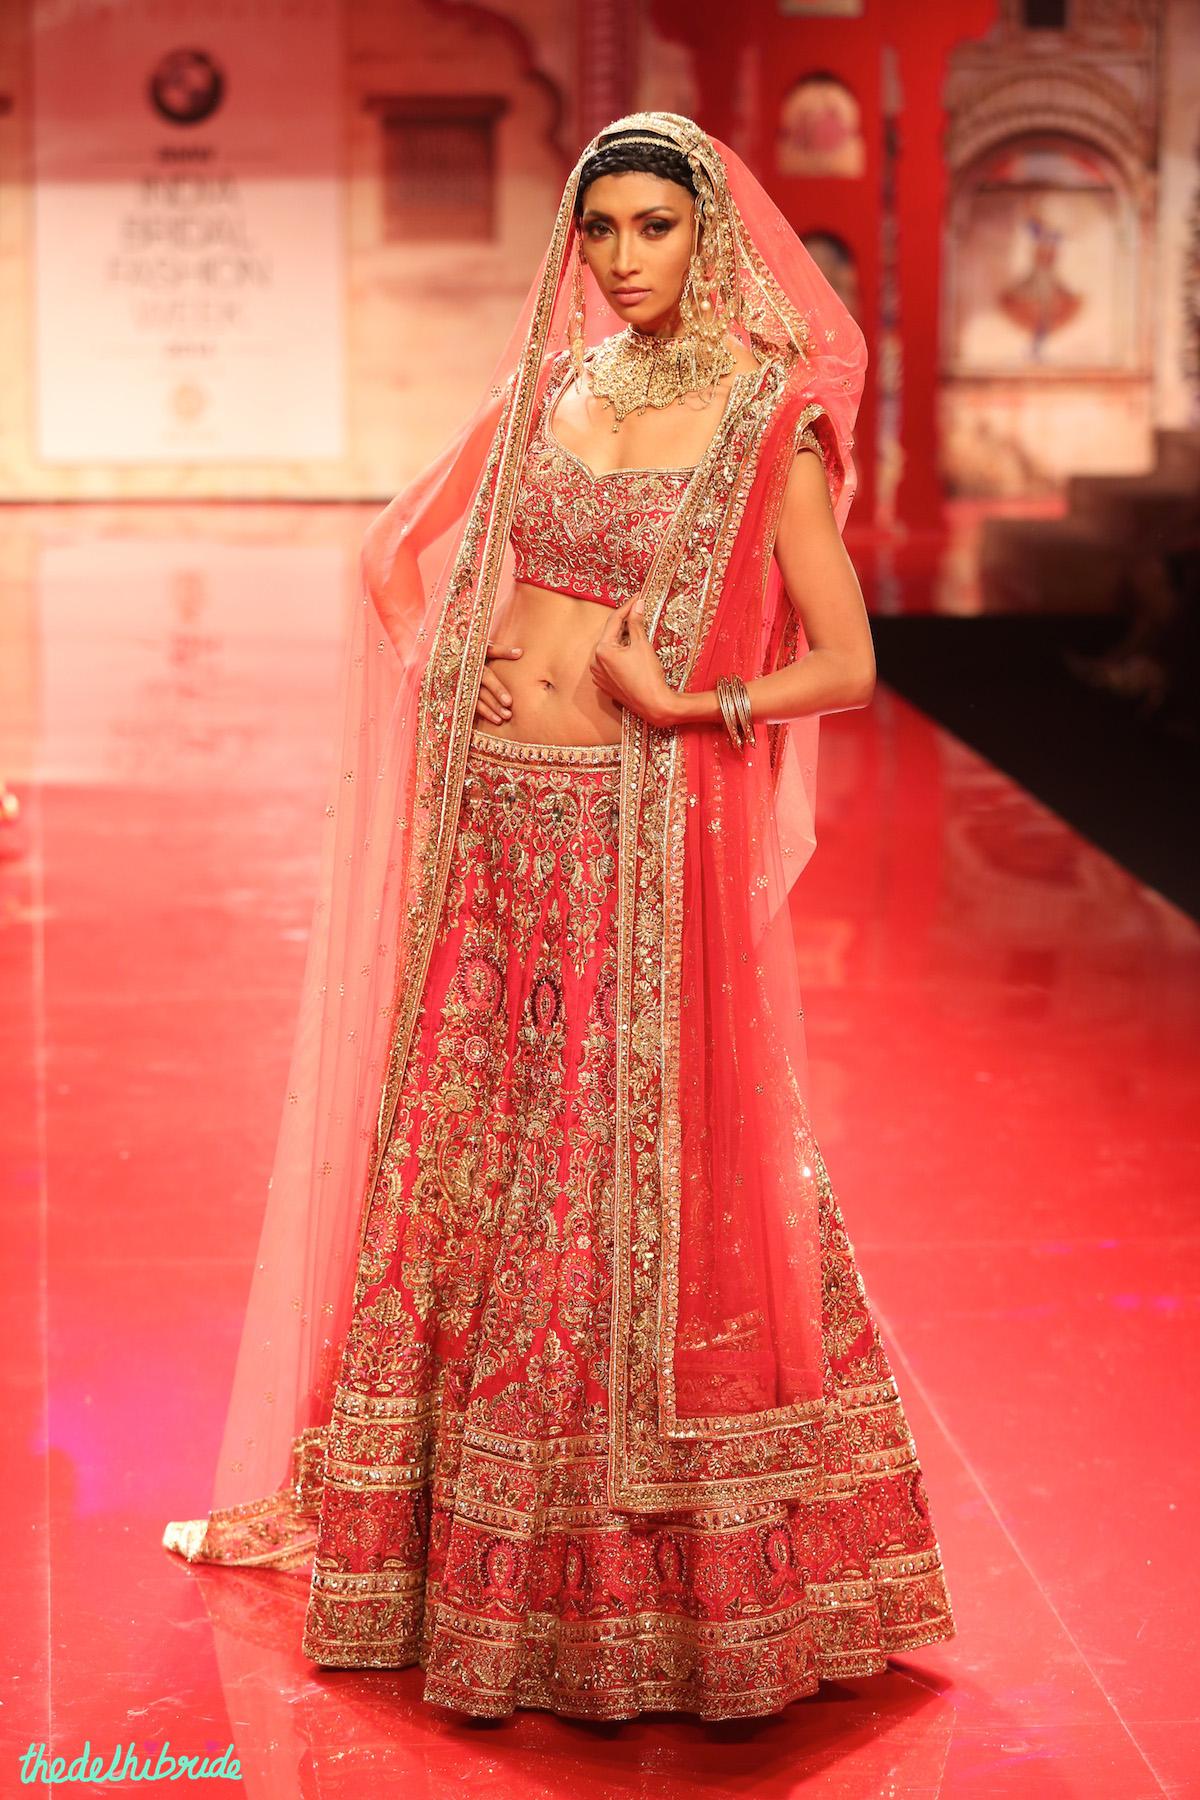 Suneet Varma At India Bridal Fashion Week 2014 An Indian Wedding Blog